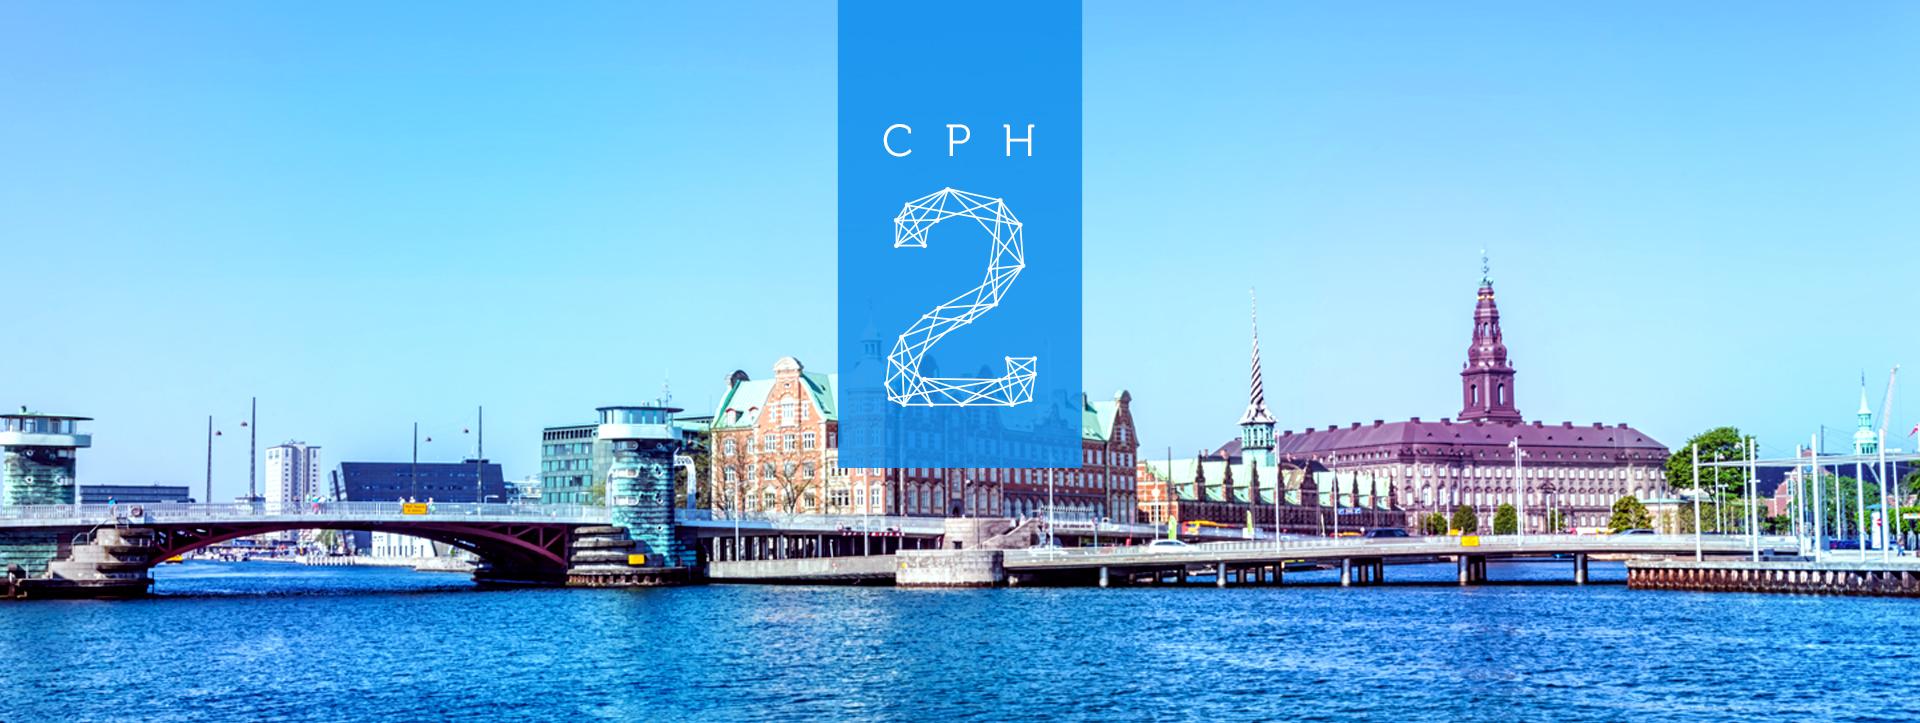 CPH2 hero banner